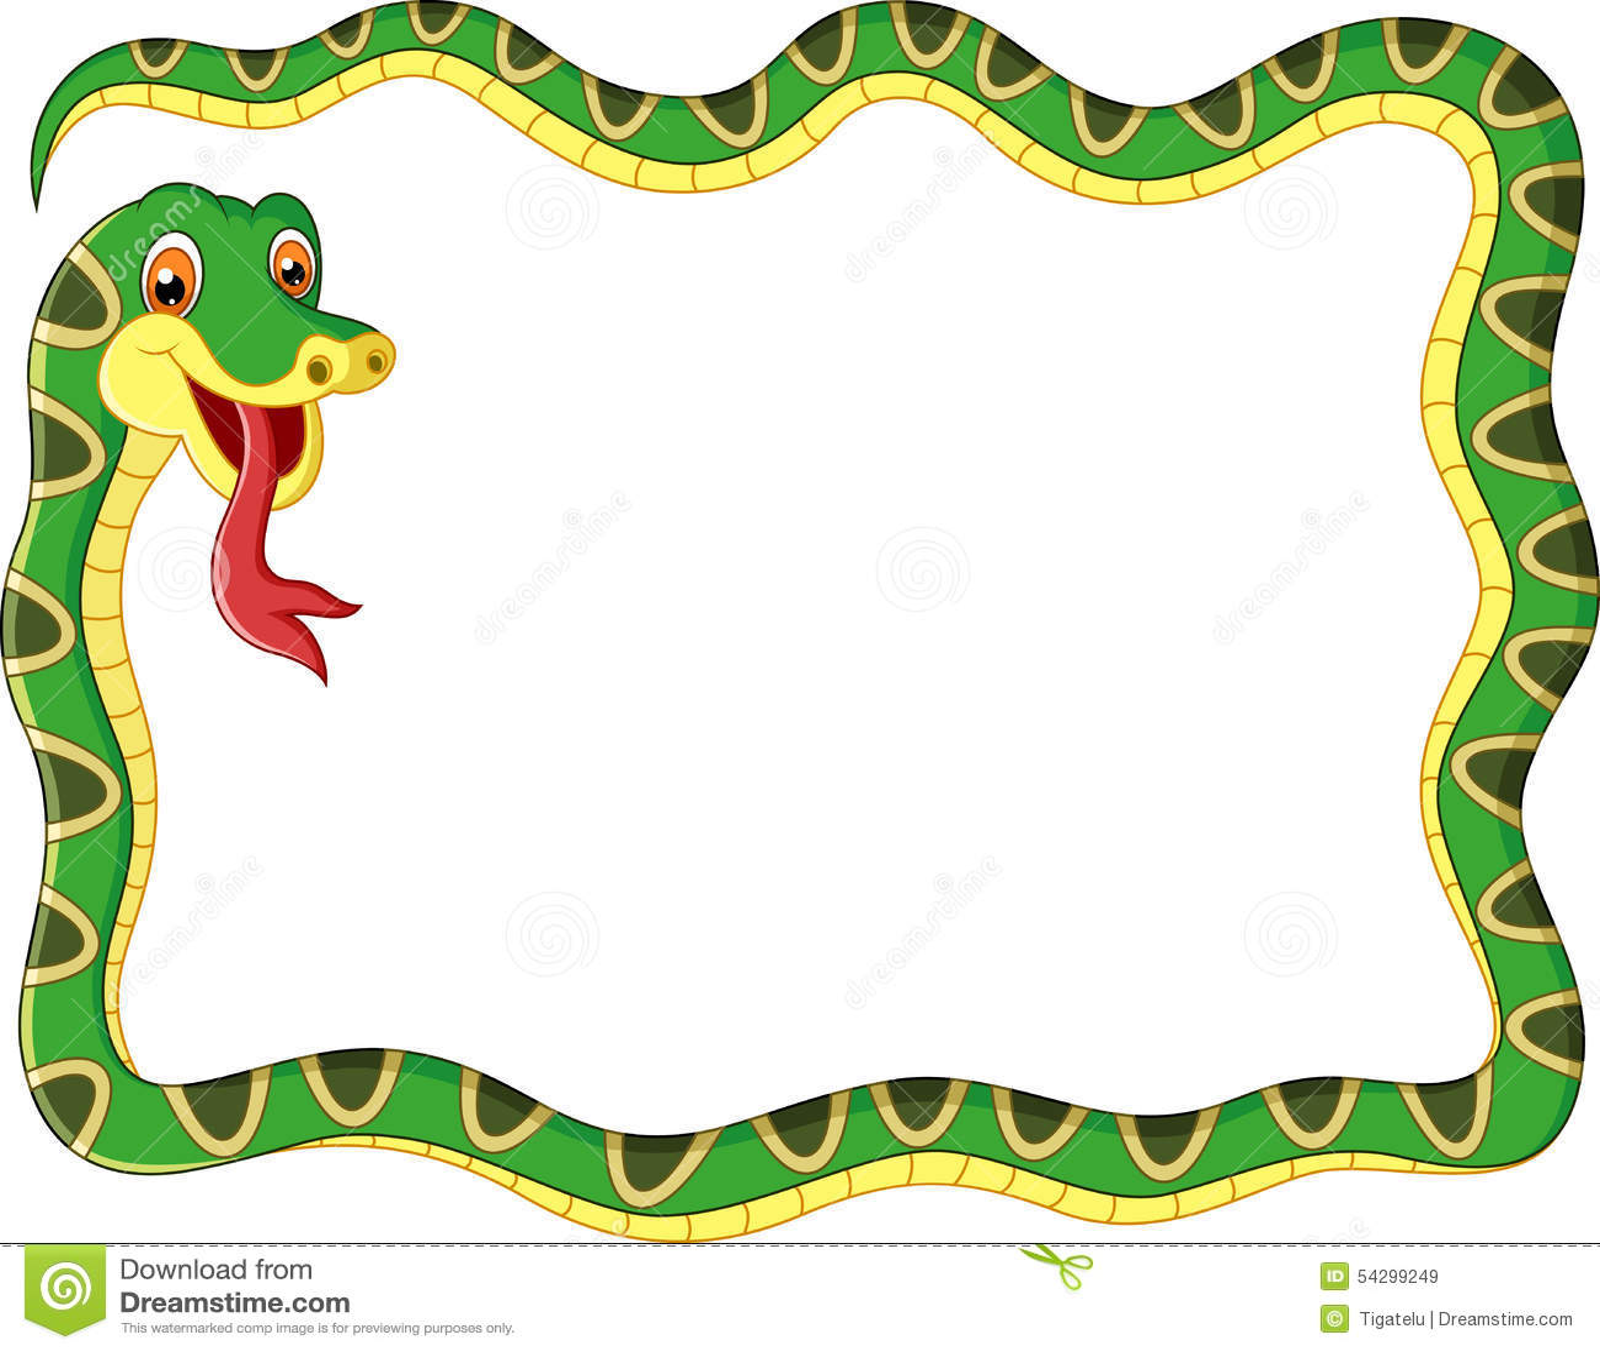 Green snake cartoon royalty free stock image image 19462406 - Cartoon Snake Frame Royalty Free Stock Images